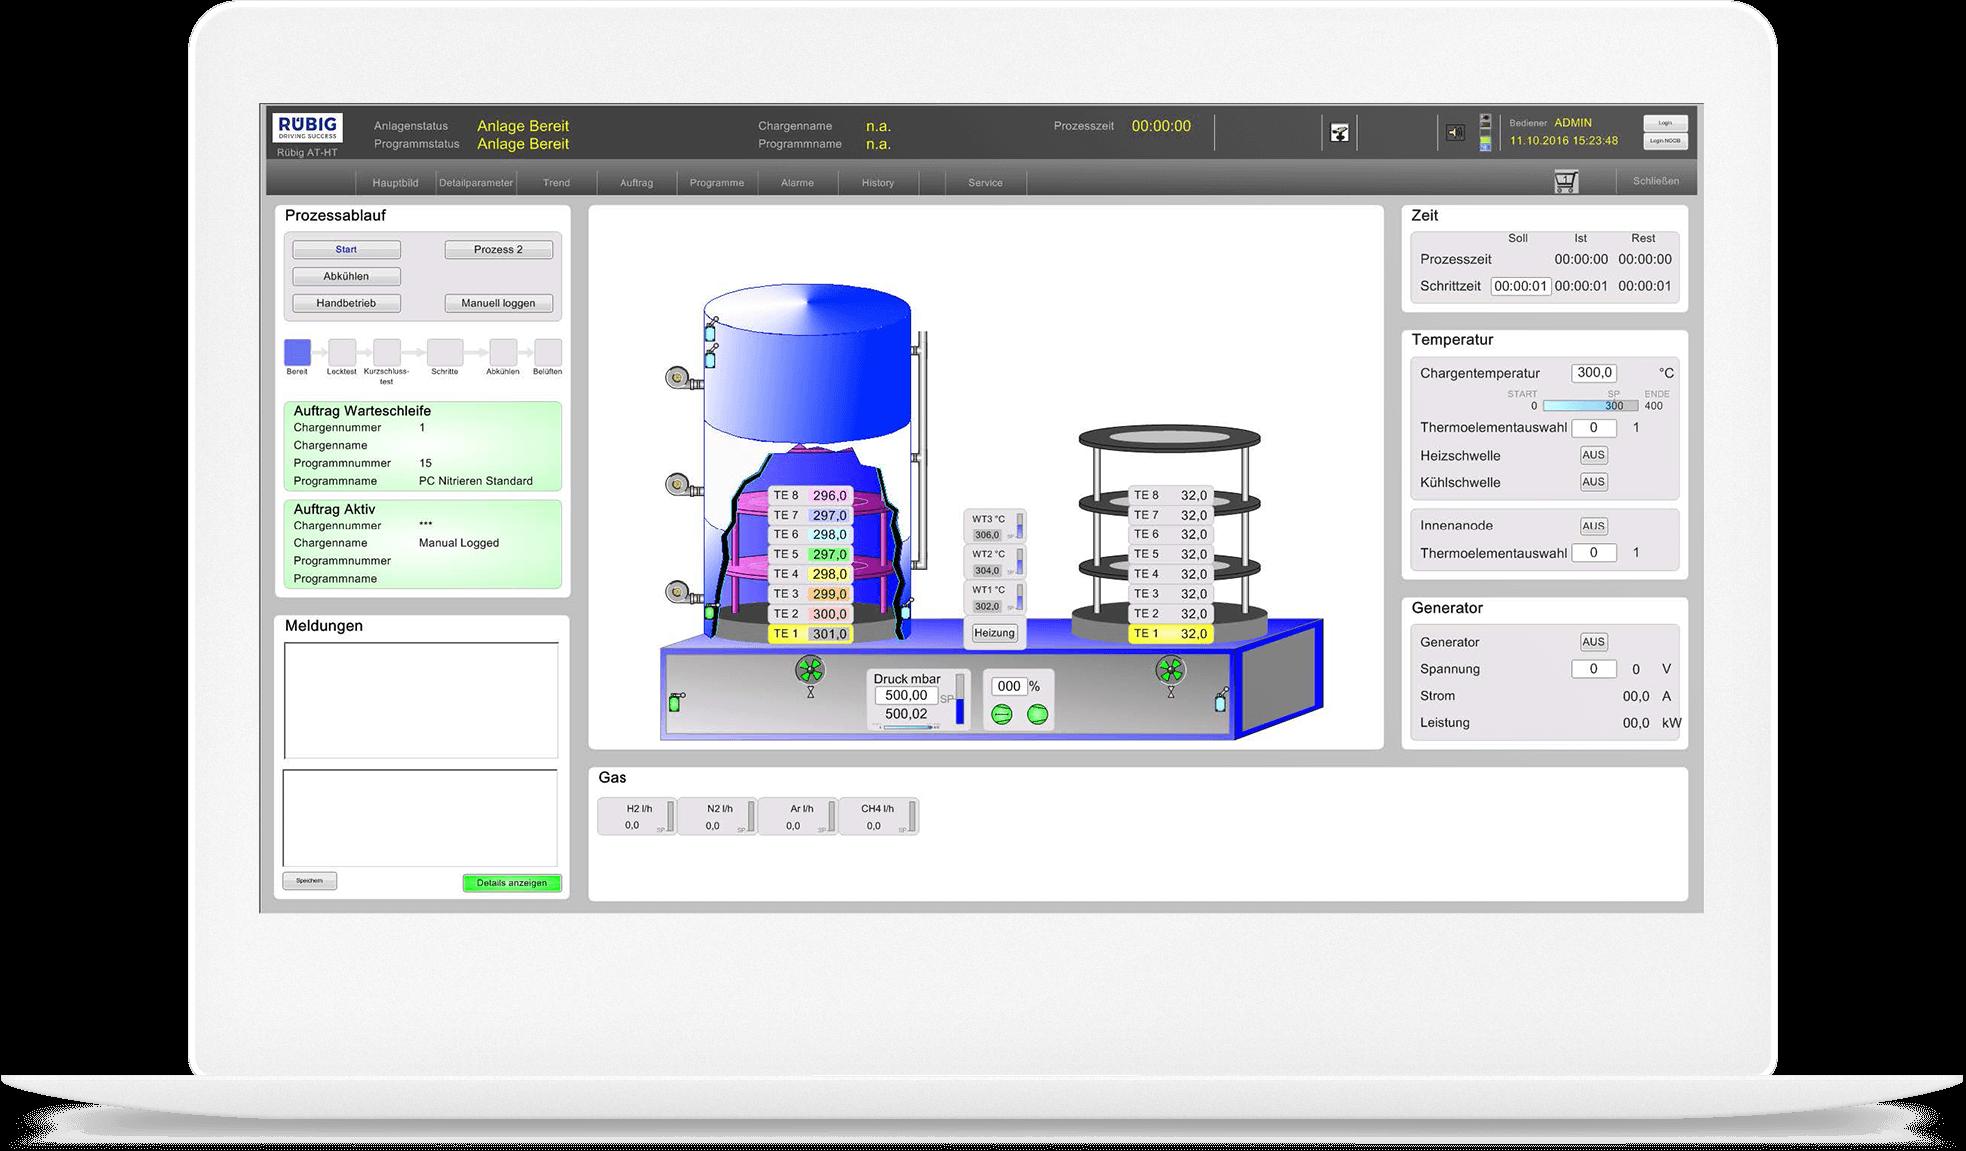 CIMPLICITY HMI/SCADA Provides Plant-Wide Visualization | Screenshot | GE Digital